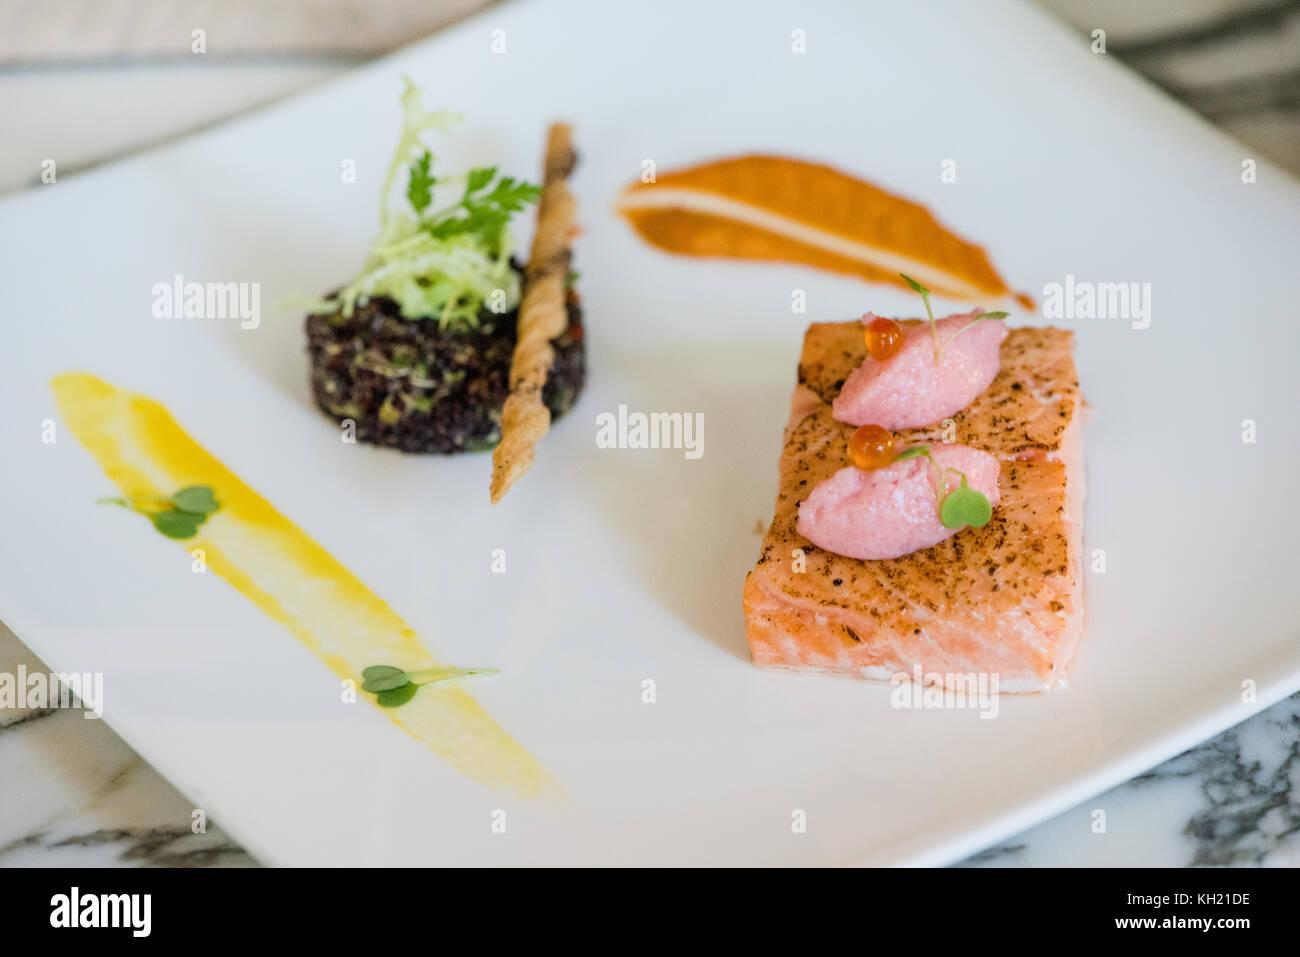 A close up of a salmon confit and quinoa salad dish - Stock Image